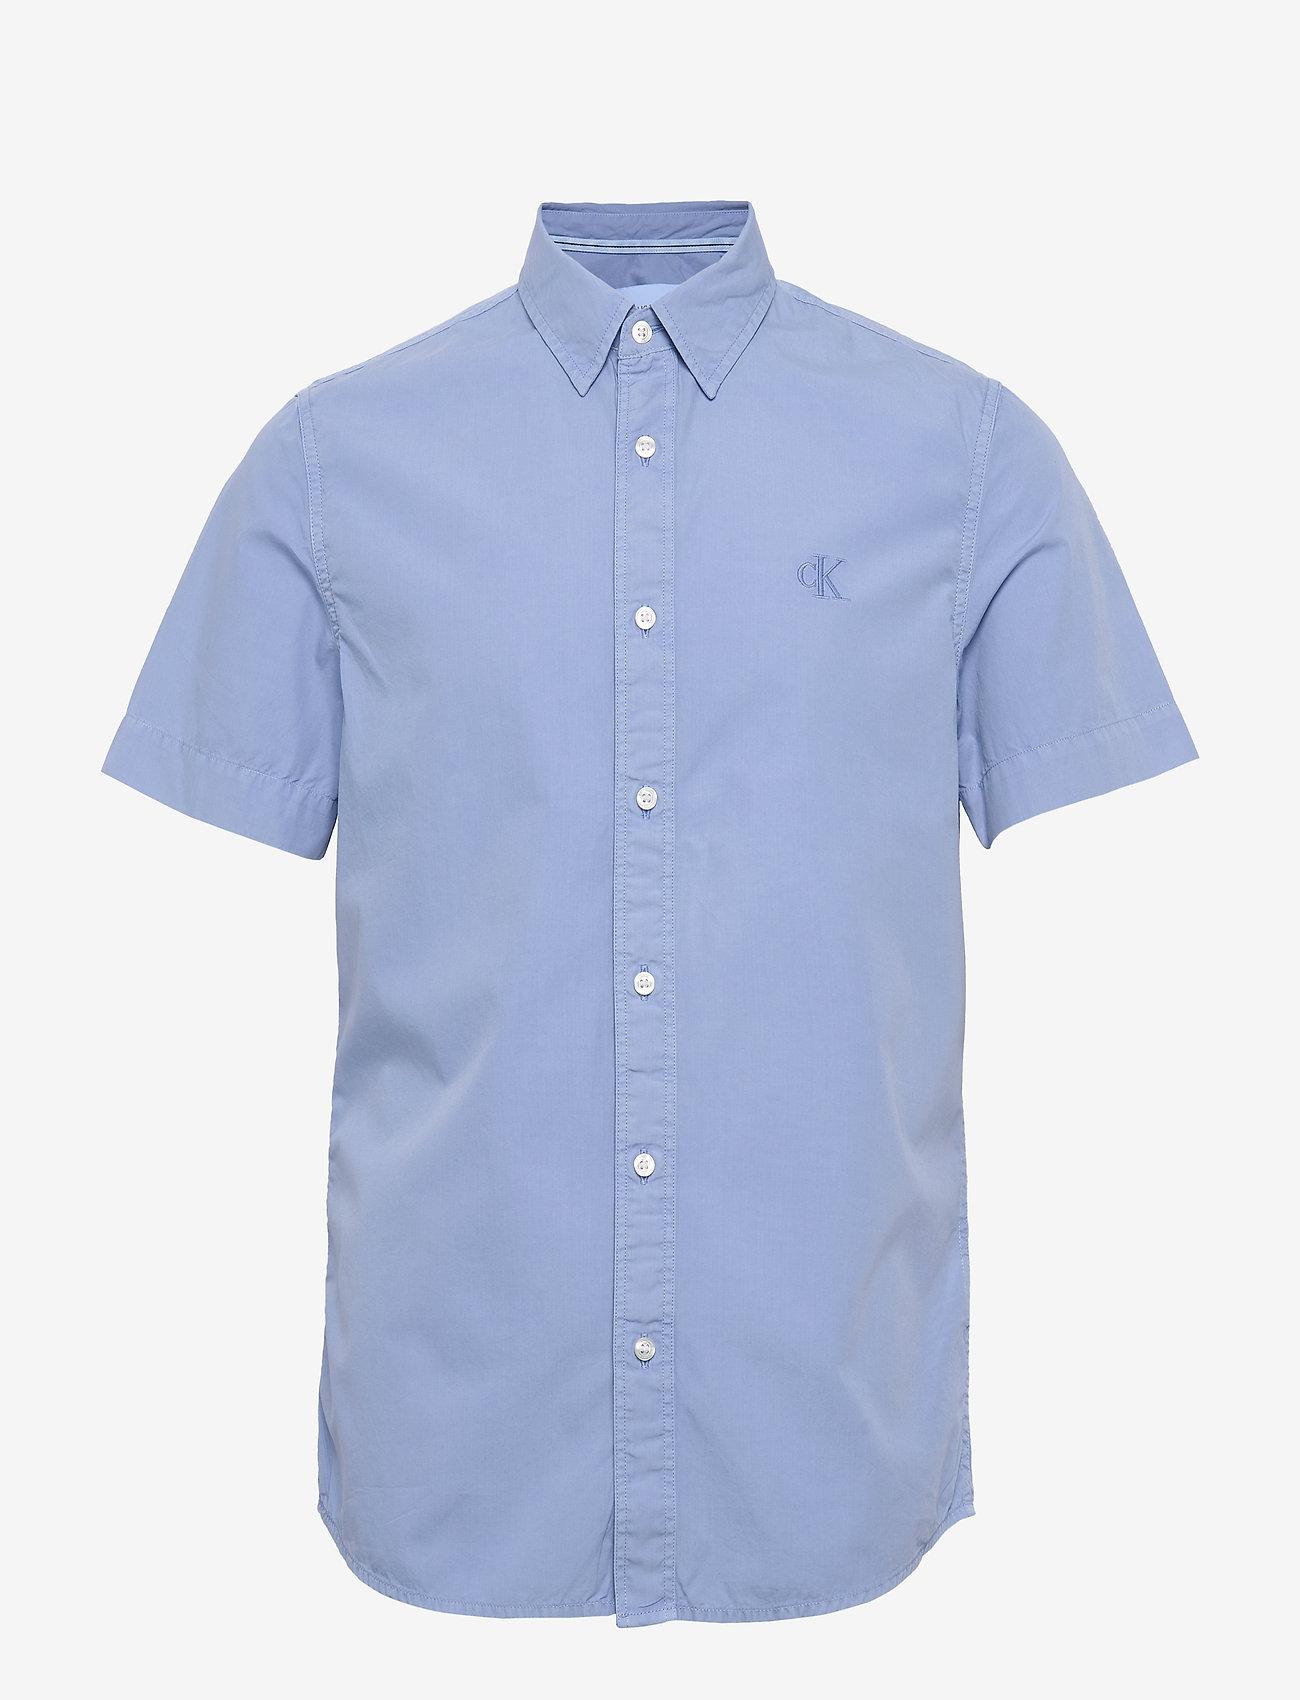 Calvin Klein Jeans - GMD 40' POPLIN SS SHIRT - basic overhemden - chambray blue - 0